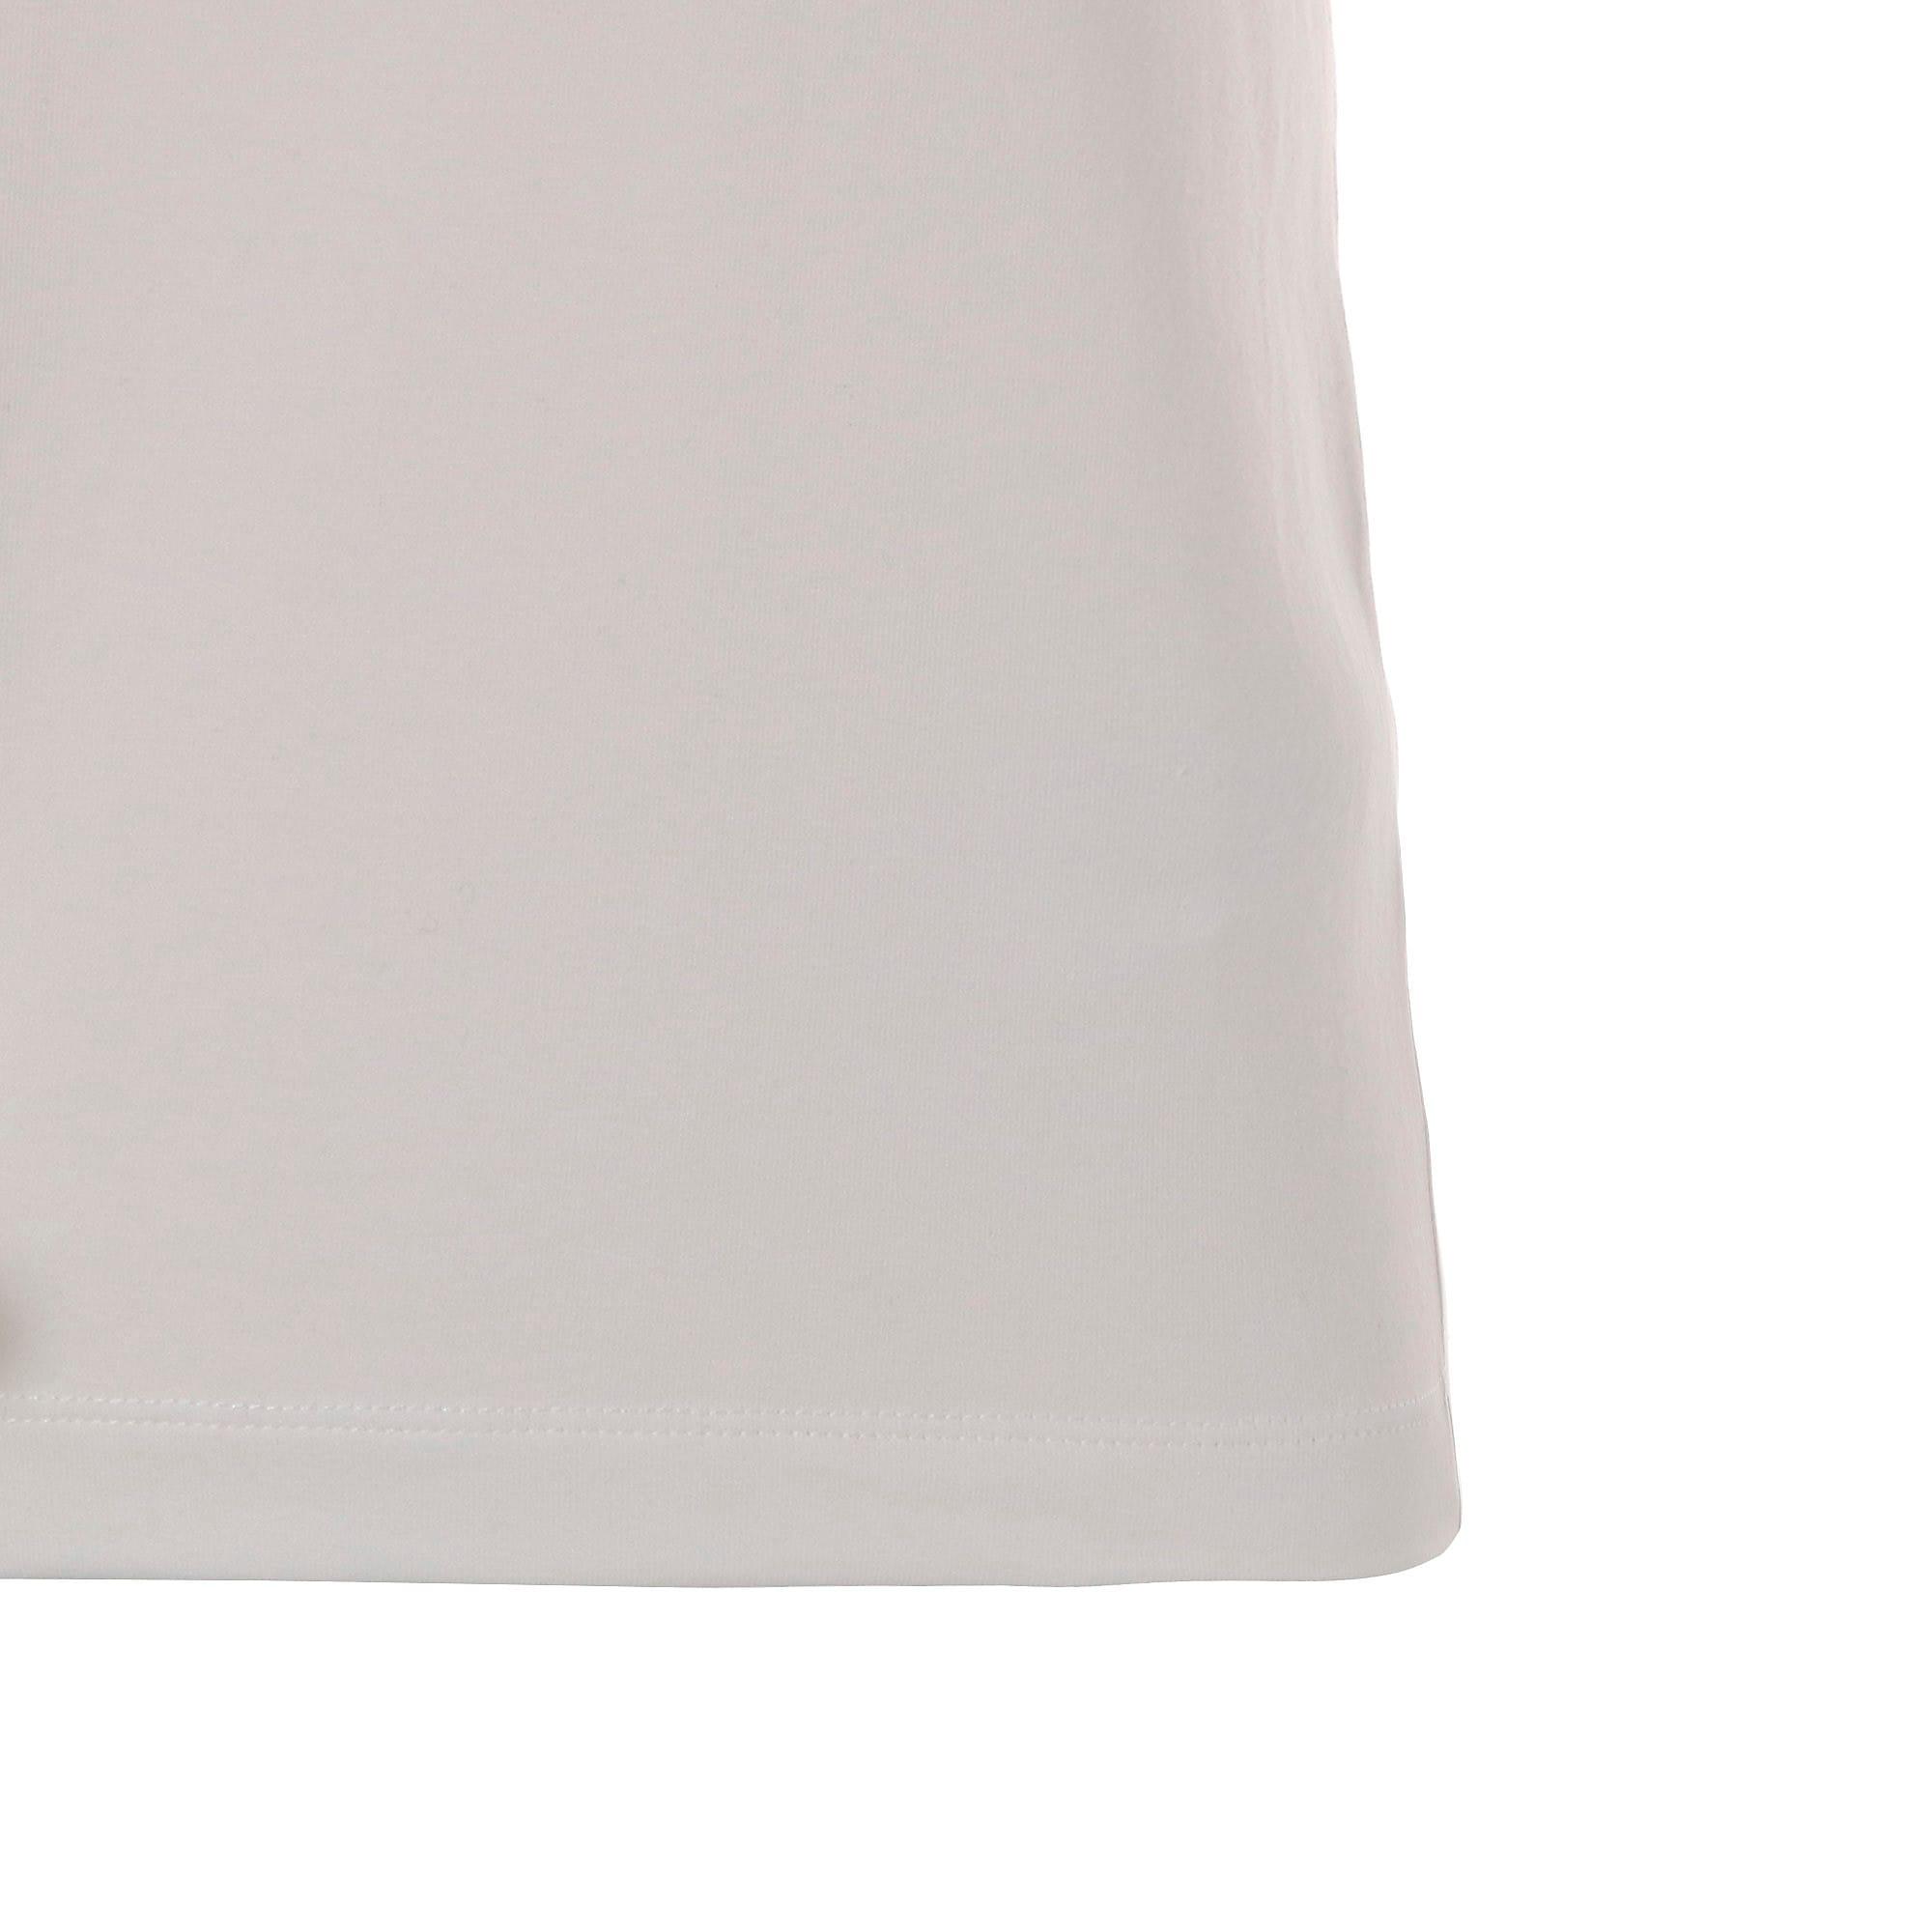 Thumbnail 8 of CLASSICS タイト ウィメンズ SS Tシャツ 半袖, Puma White-black, medium-JPN